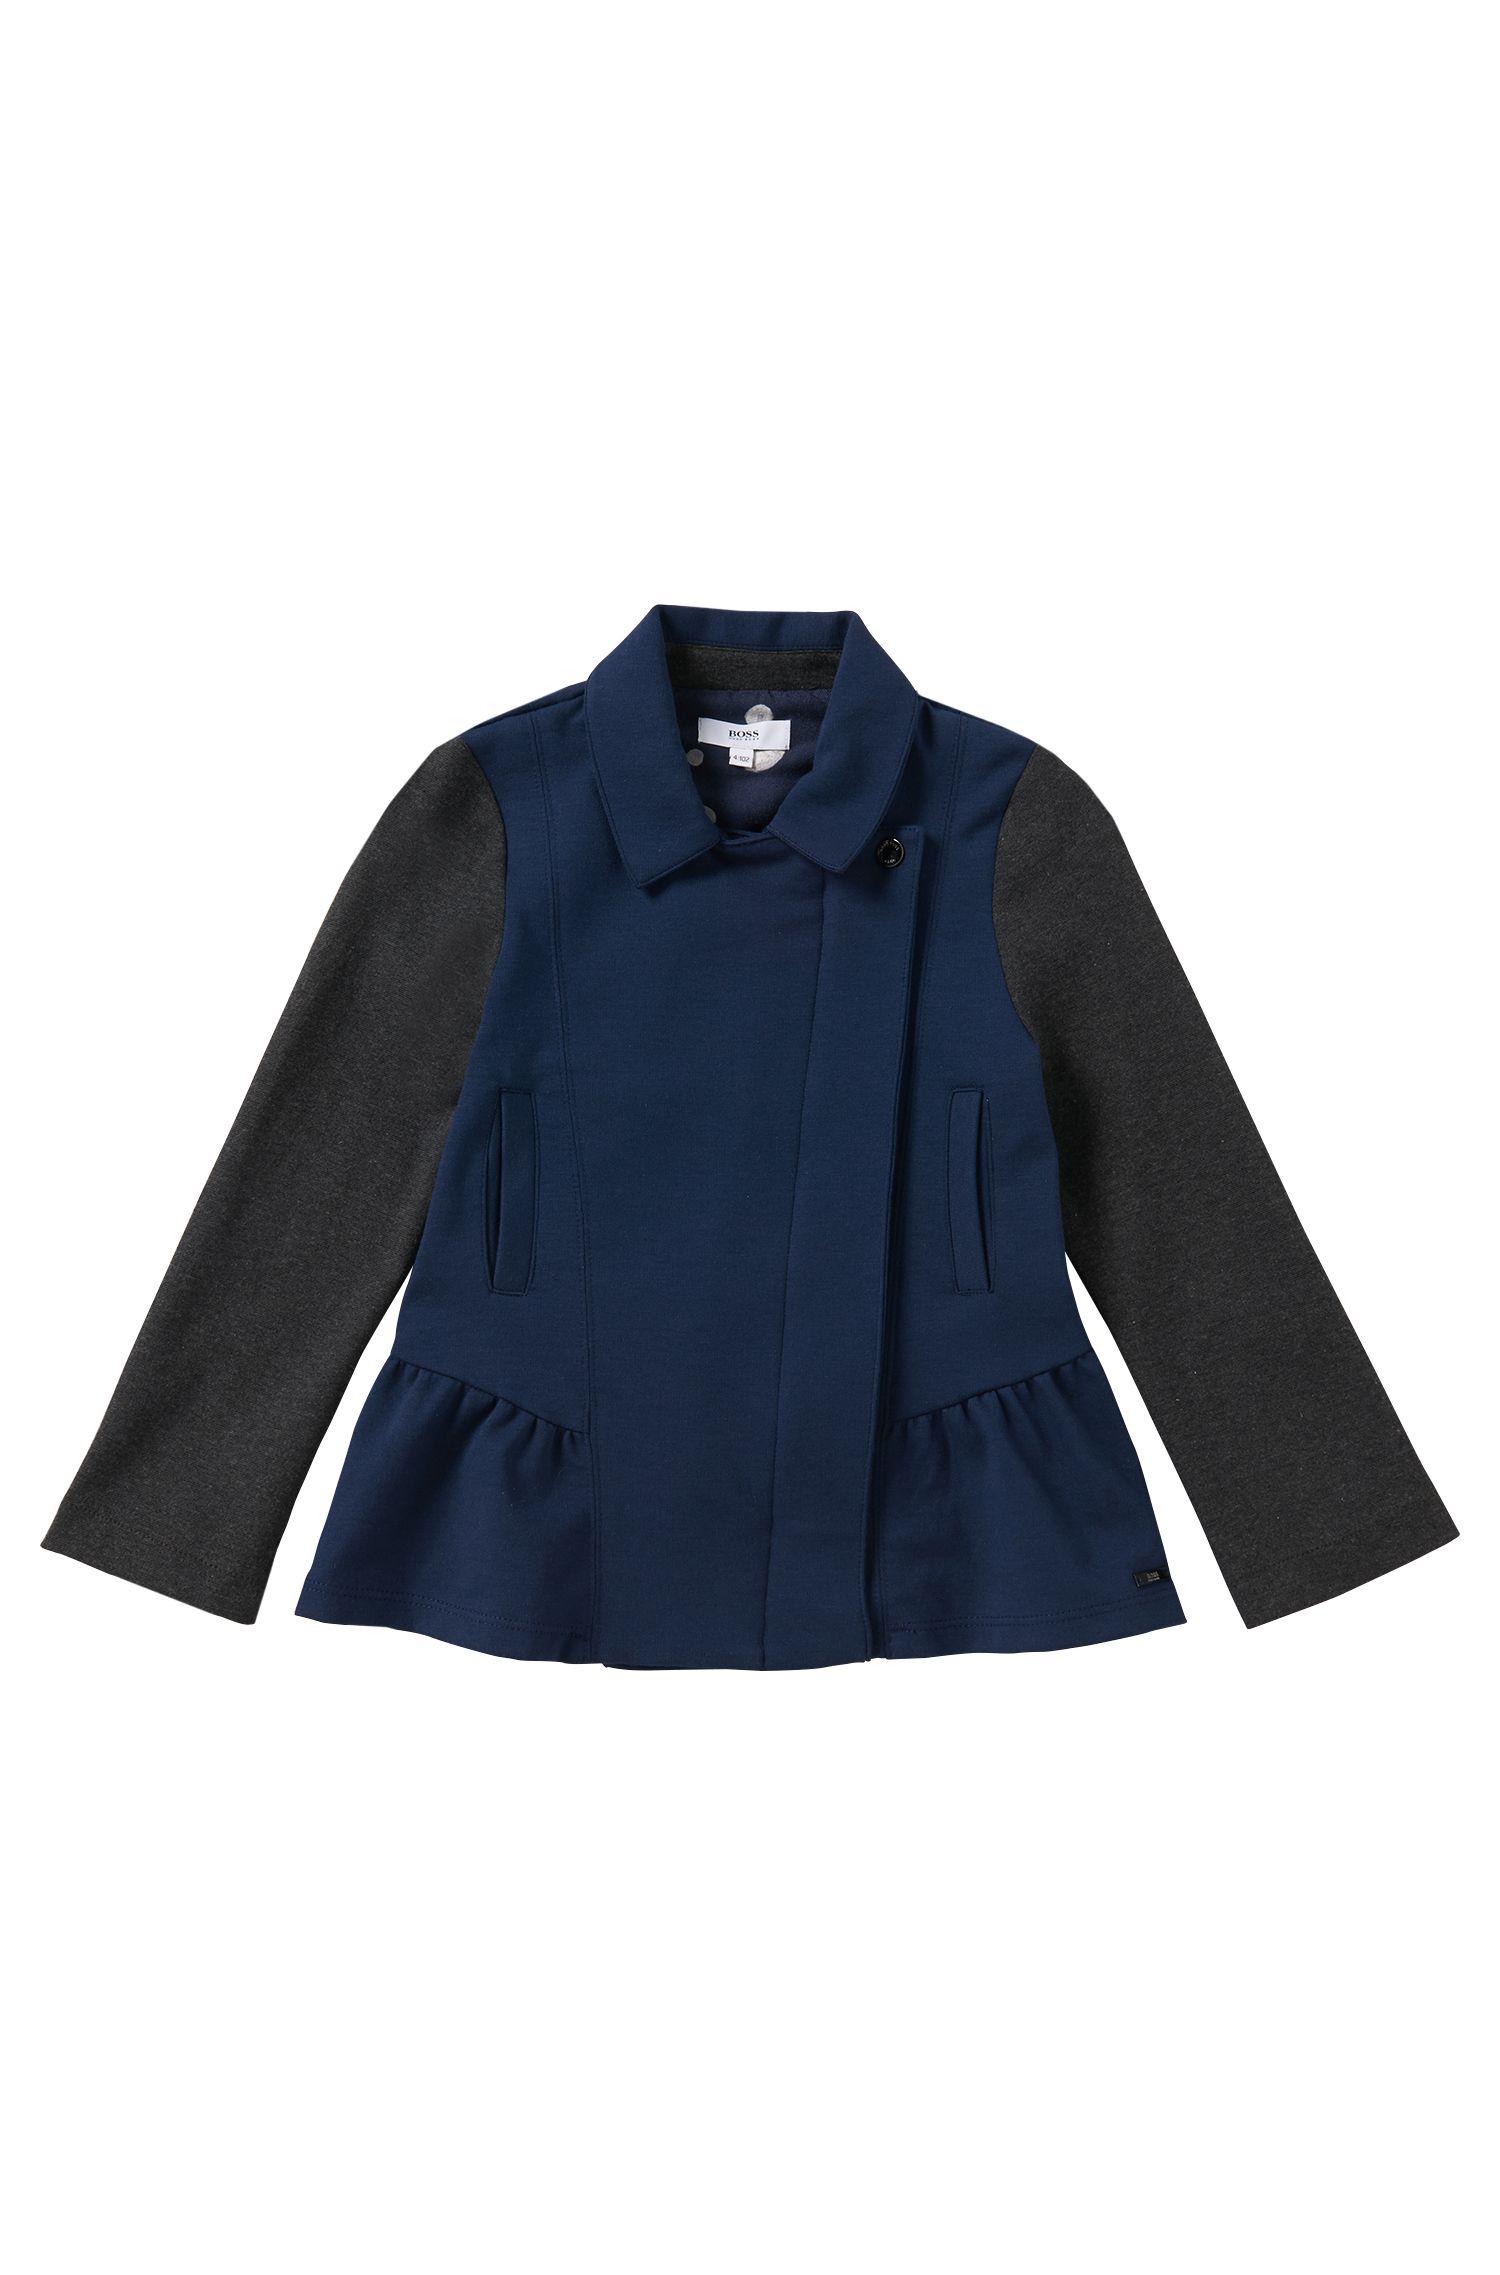 Sweatshirt-Jacke aus Baumwoll-Mix: 'J15314'